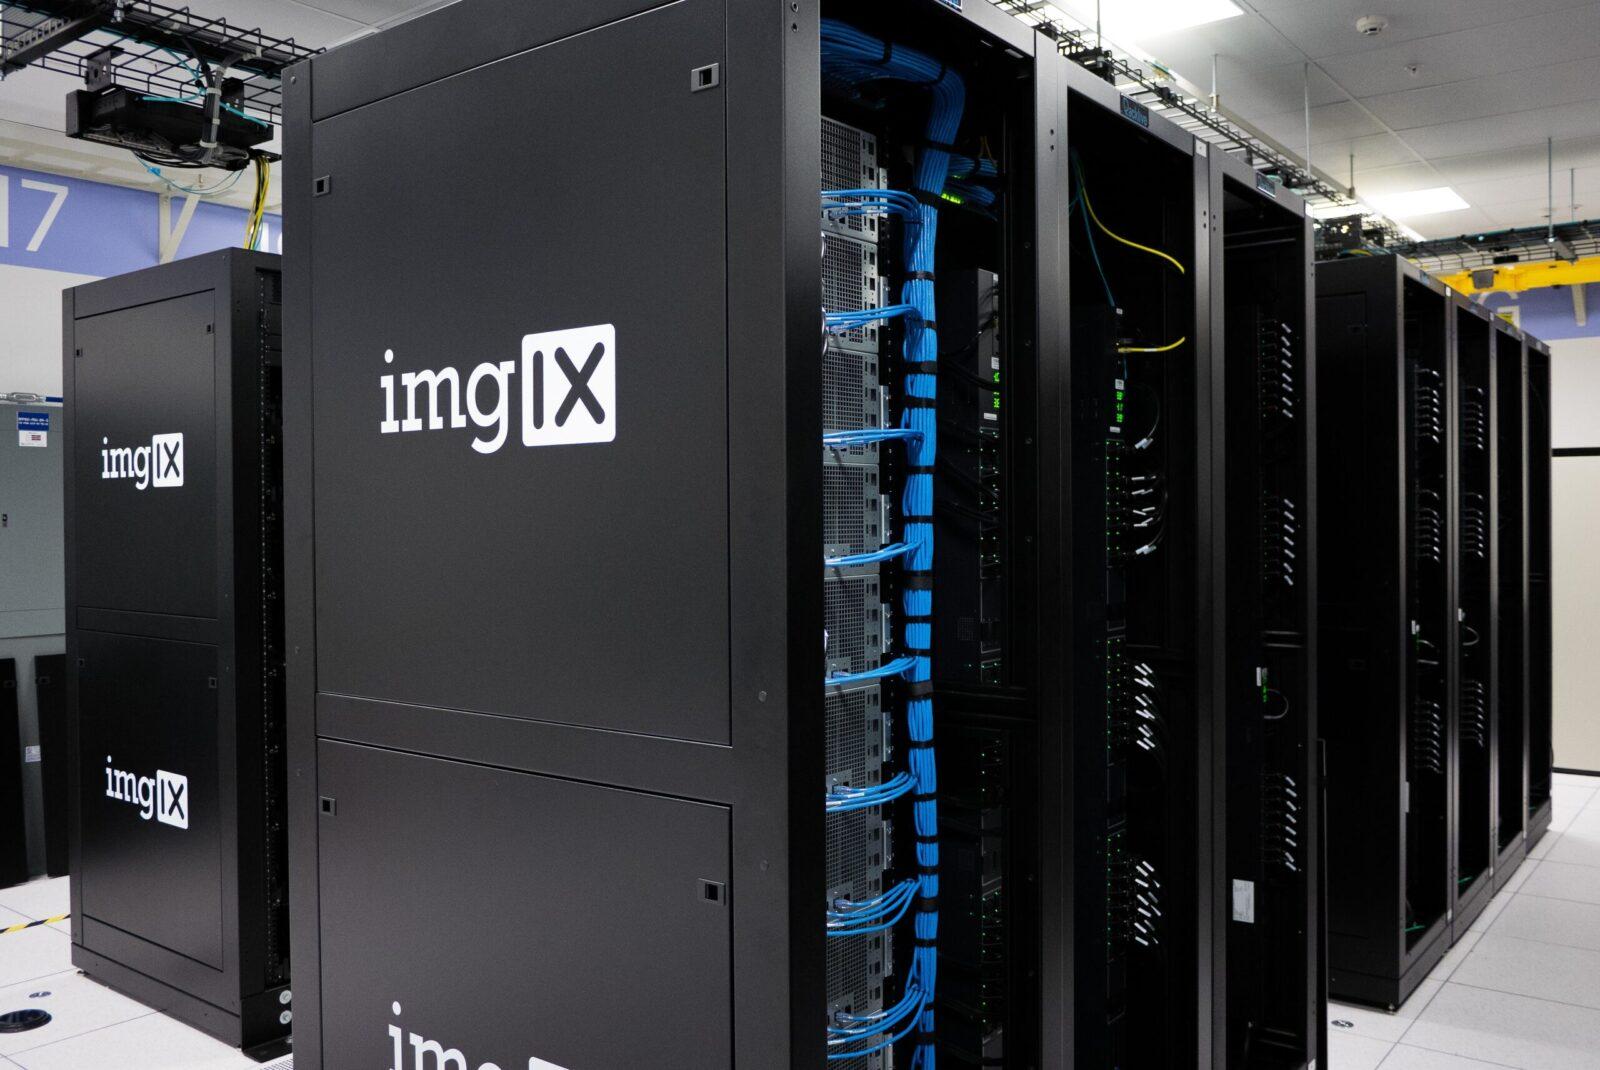 black ImgIX server system